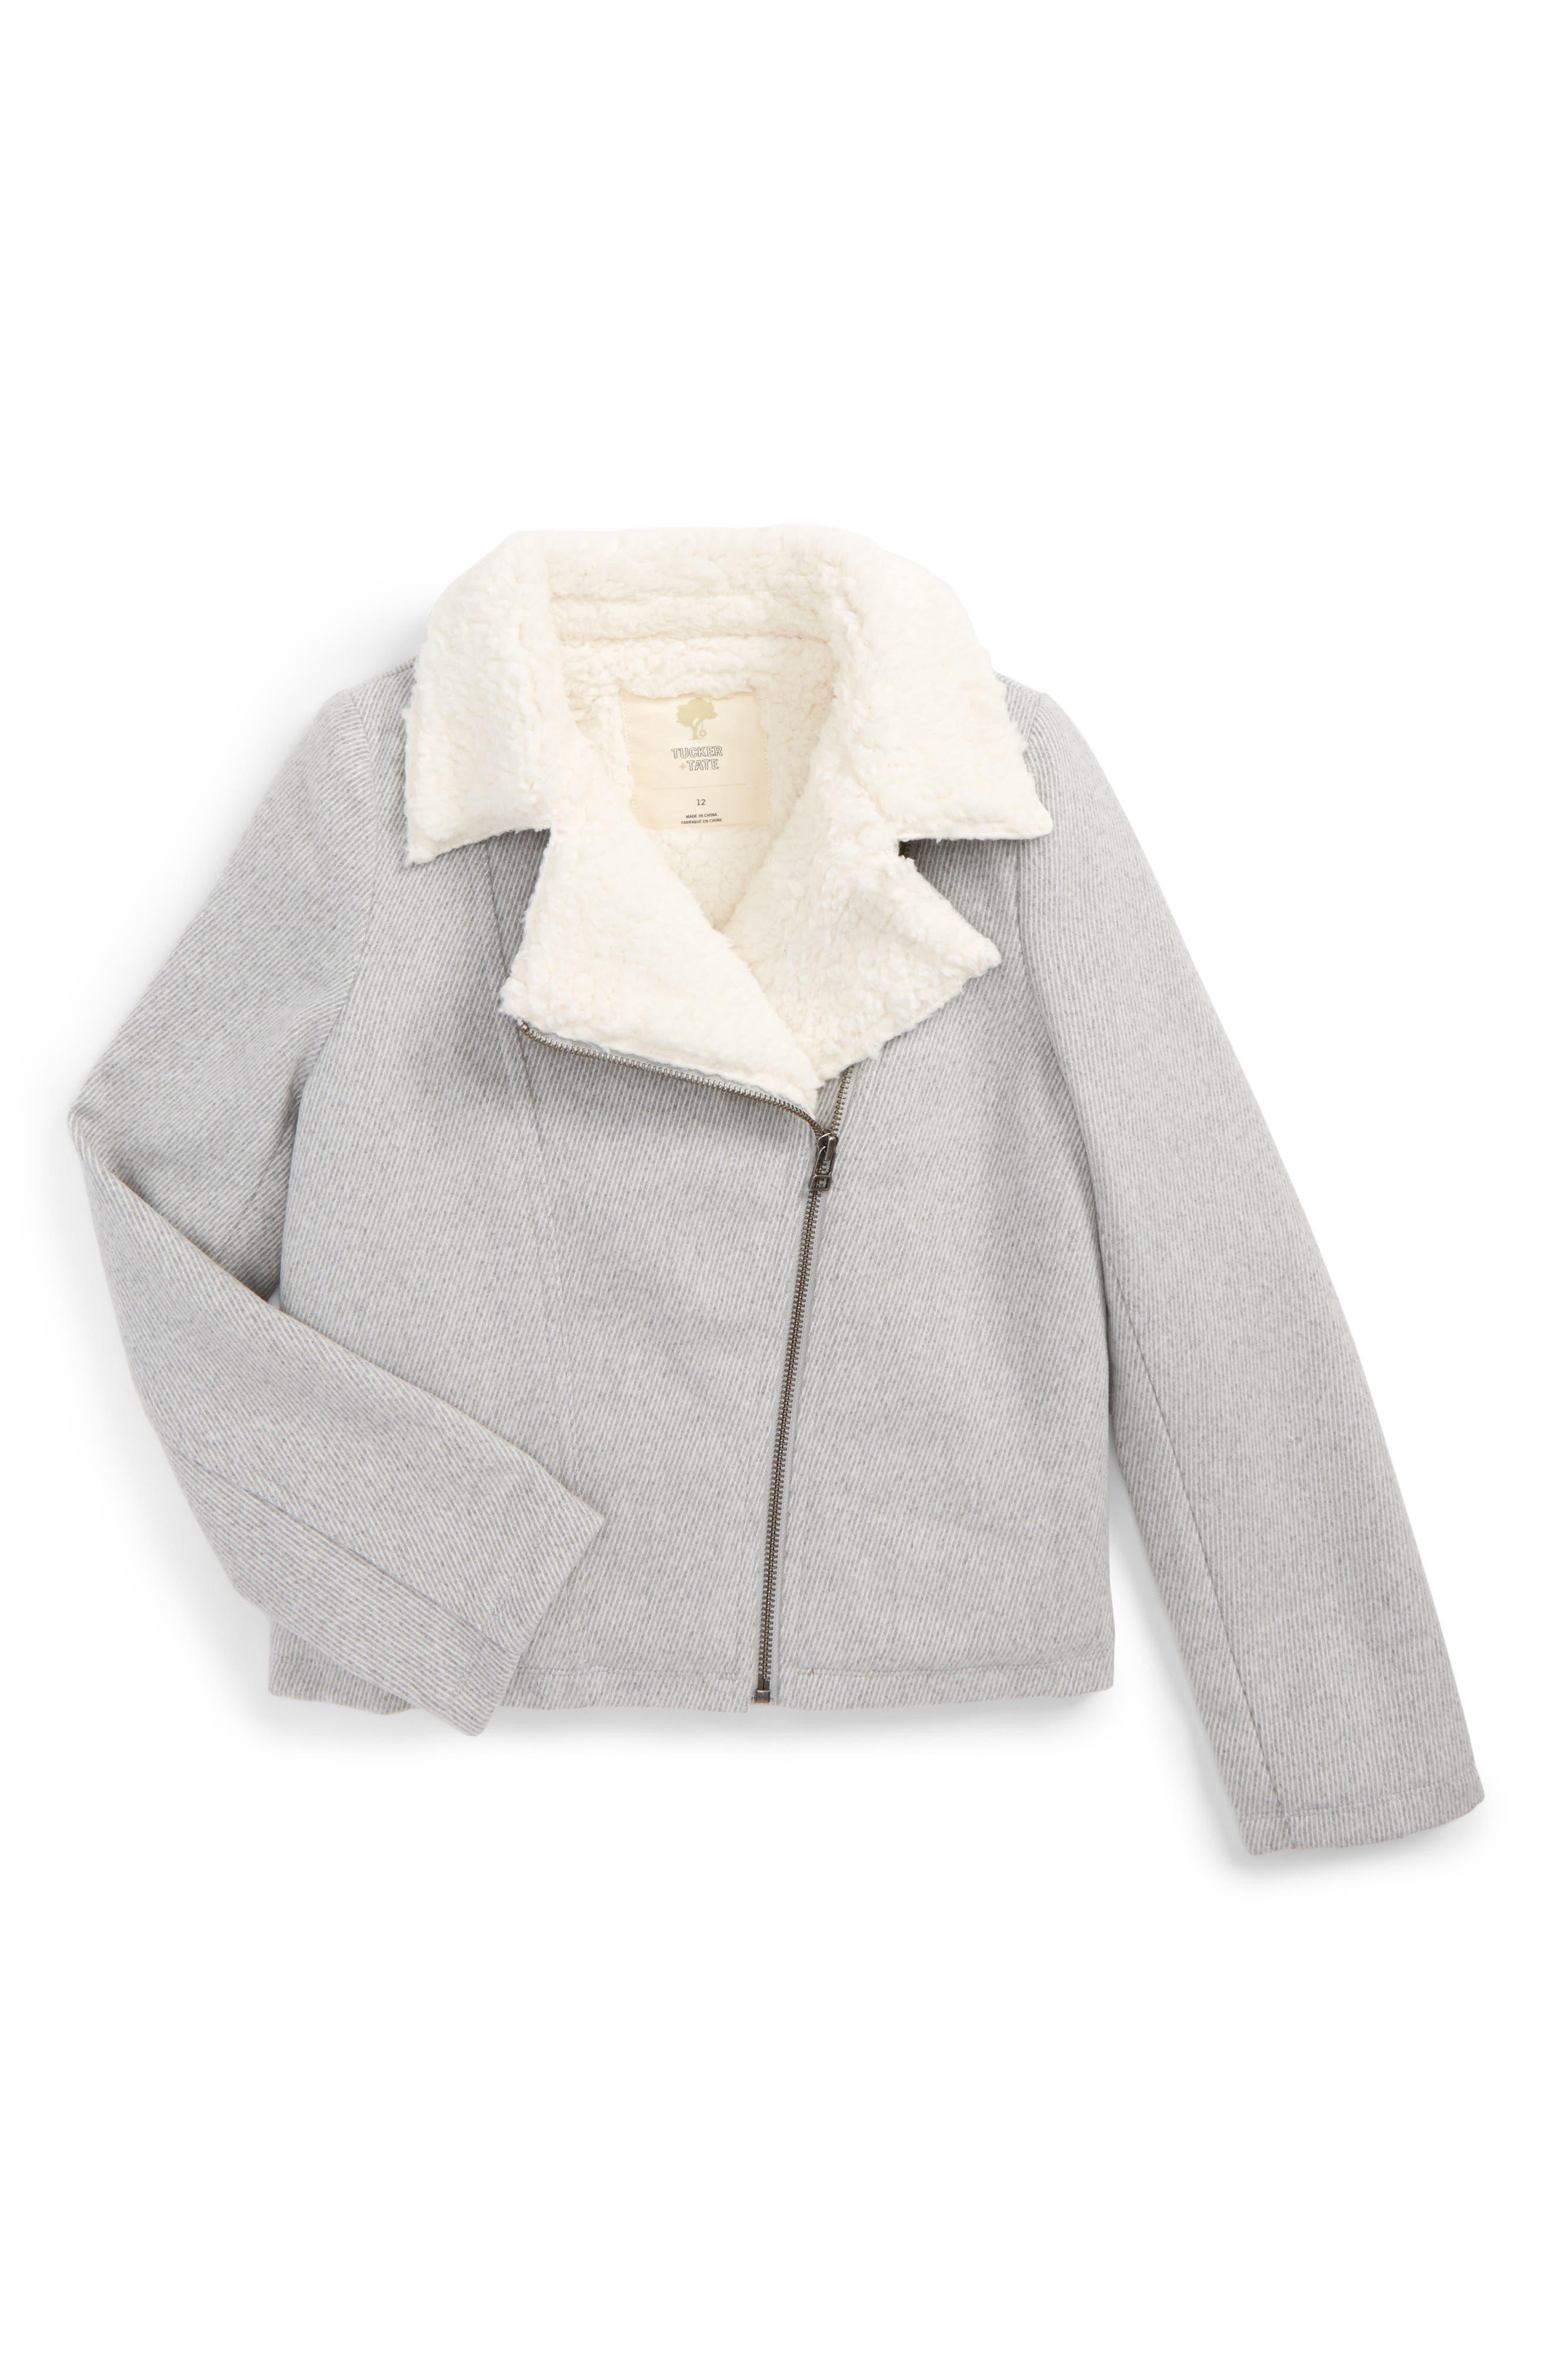 Tucker + Tate Knit Moto Jacket with Faux Fur Lining (Big Girls)